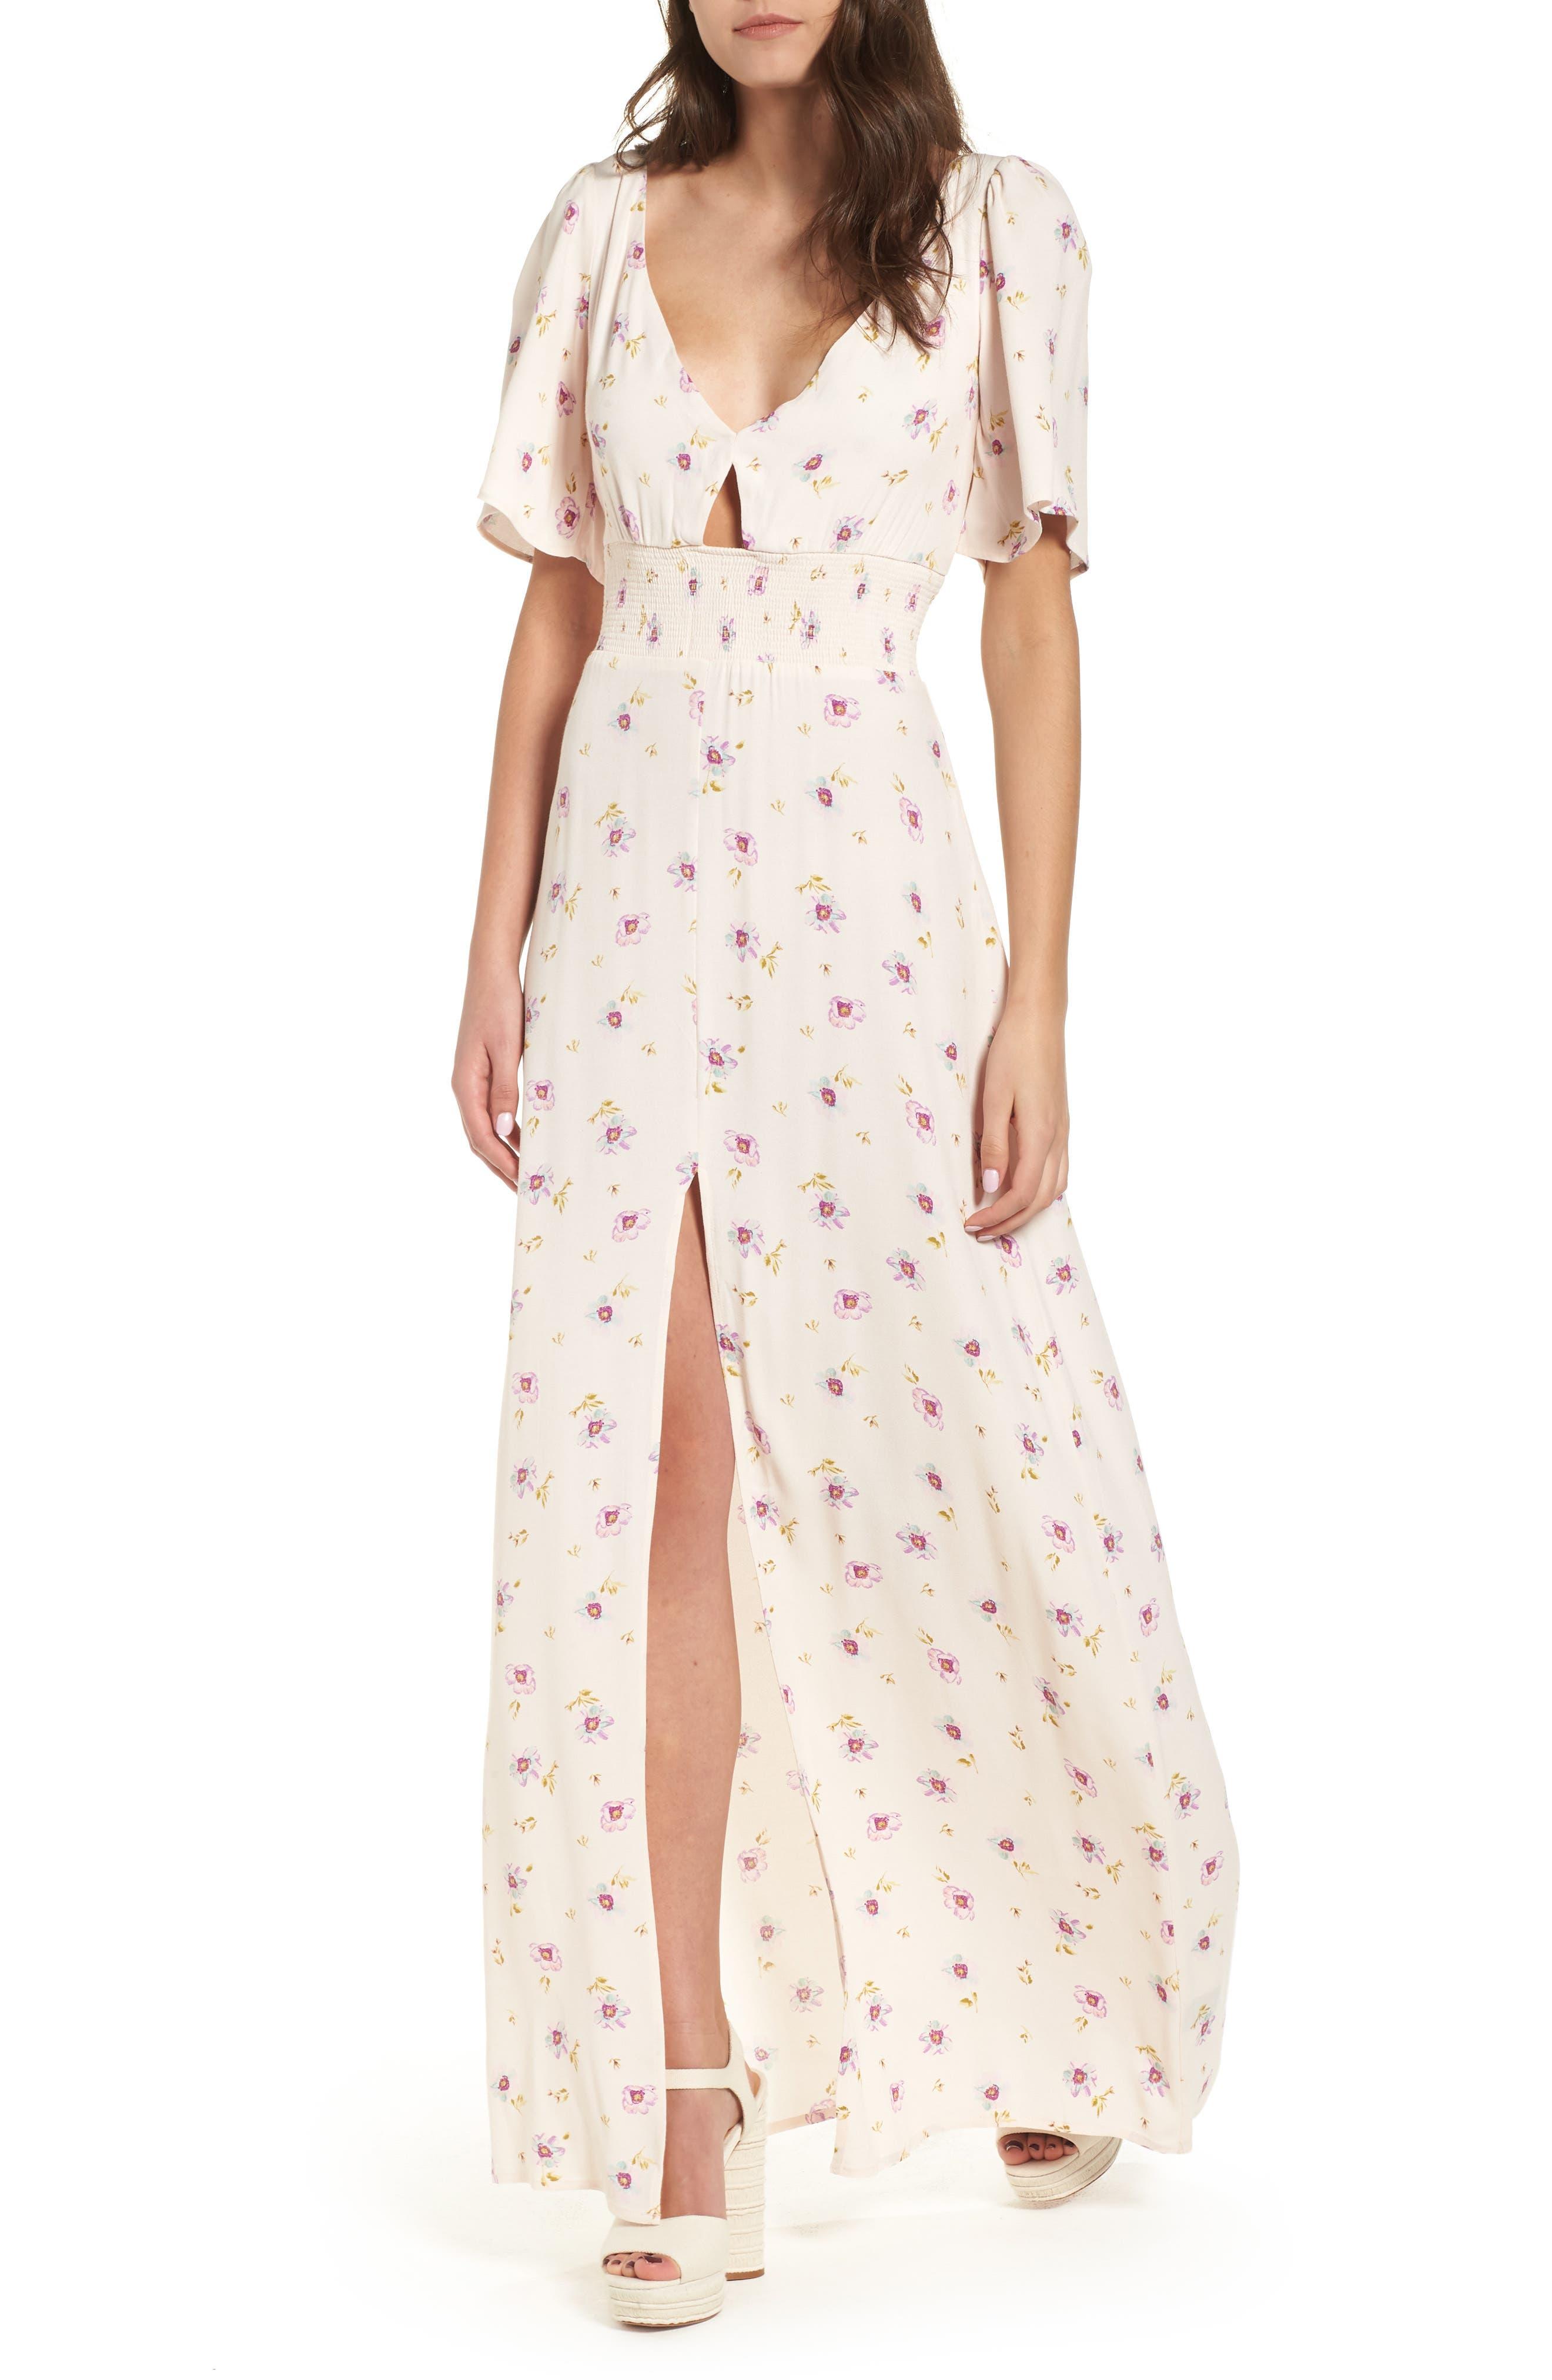 AFRM Tuscany Maxi Dress